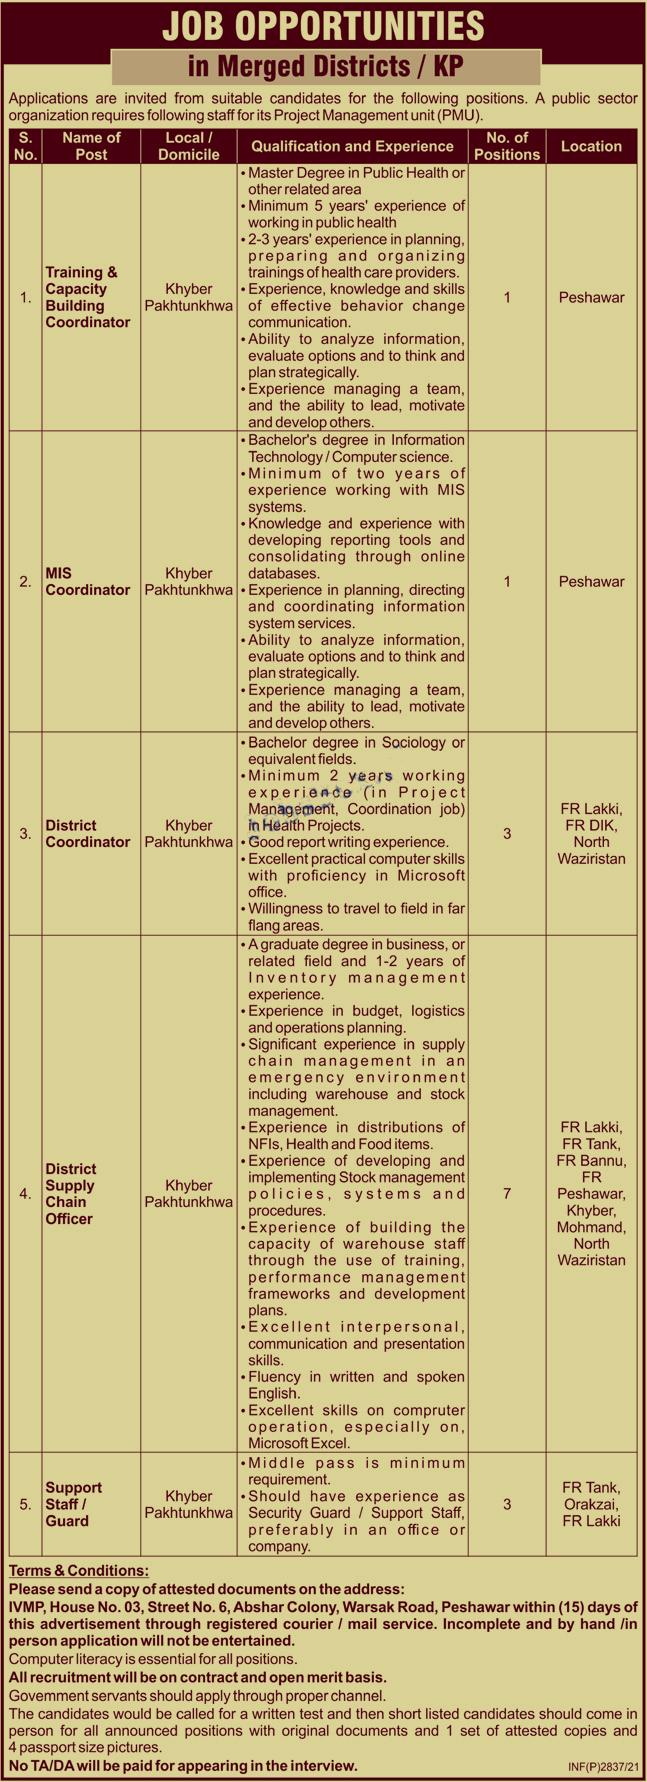 Public Sector Organization KPK Jobs 2021